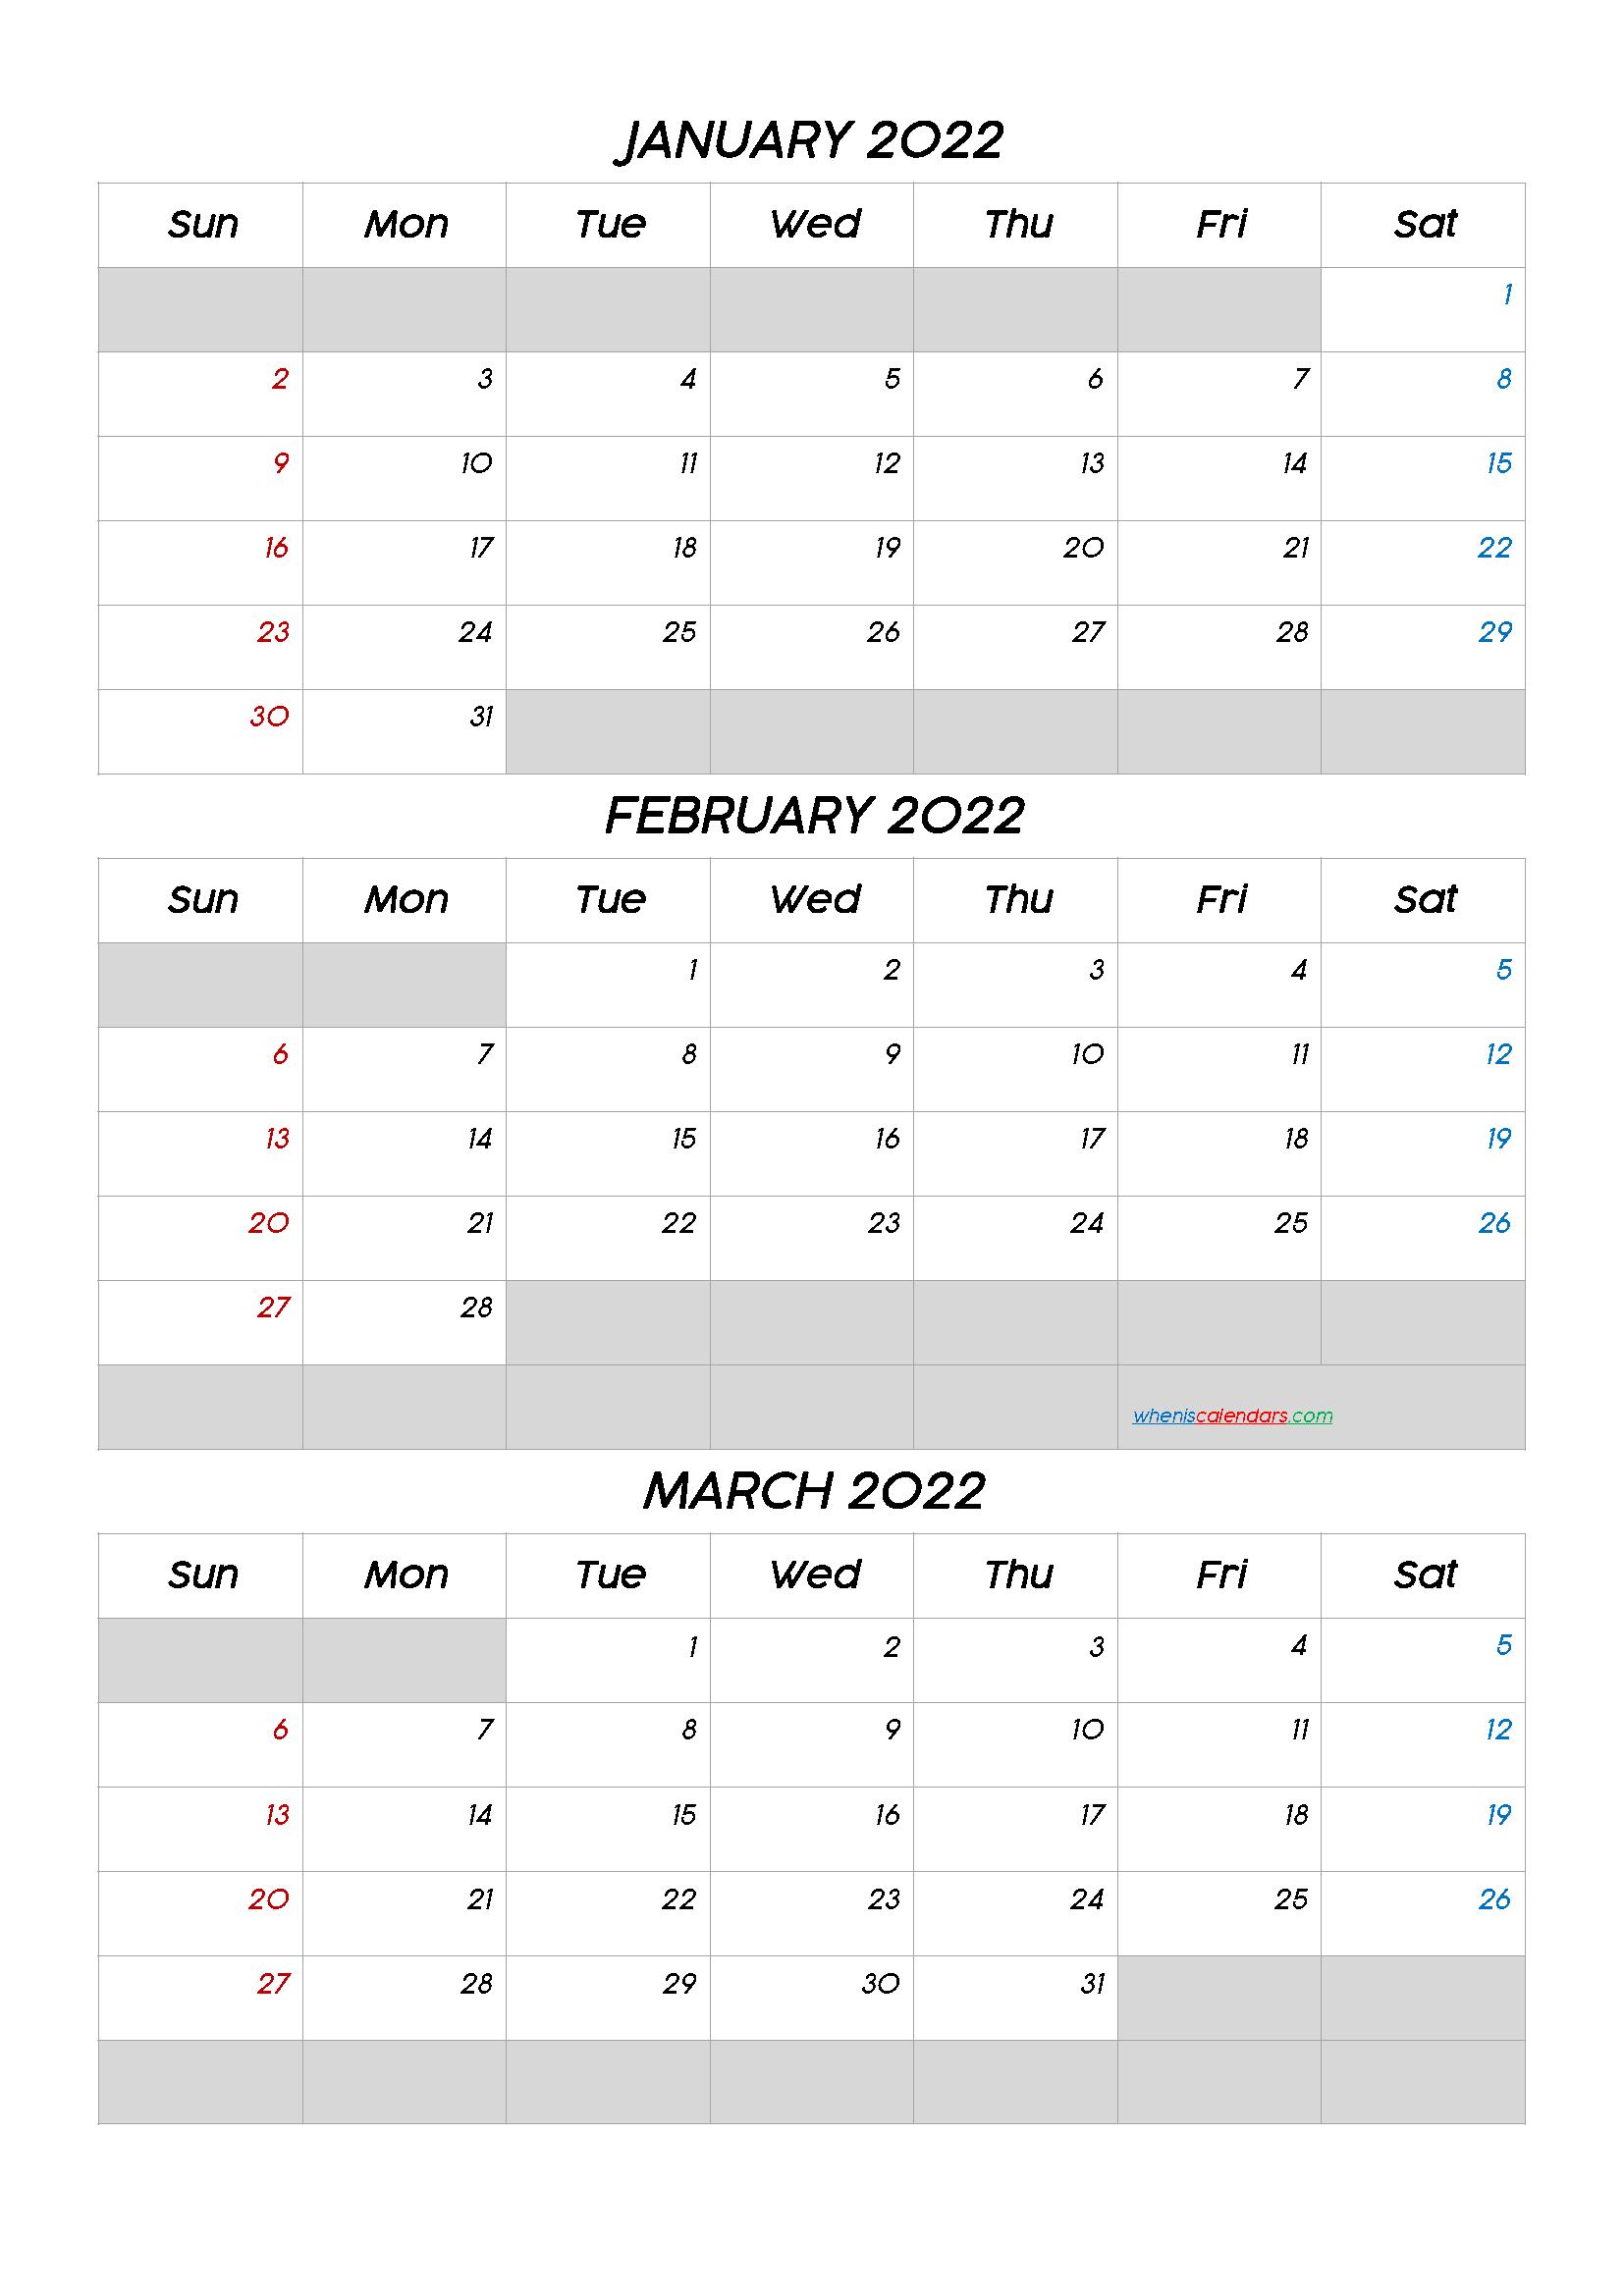 Printable Calendar April 2021 To March 2022 - Yearmon regarding March April May 2022 Calendar Printable Graphics